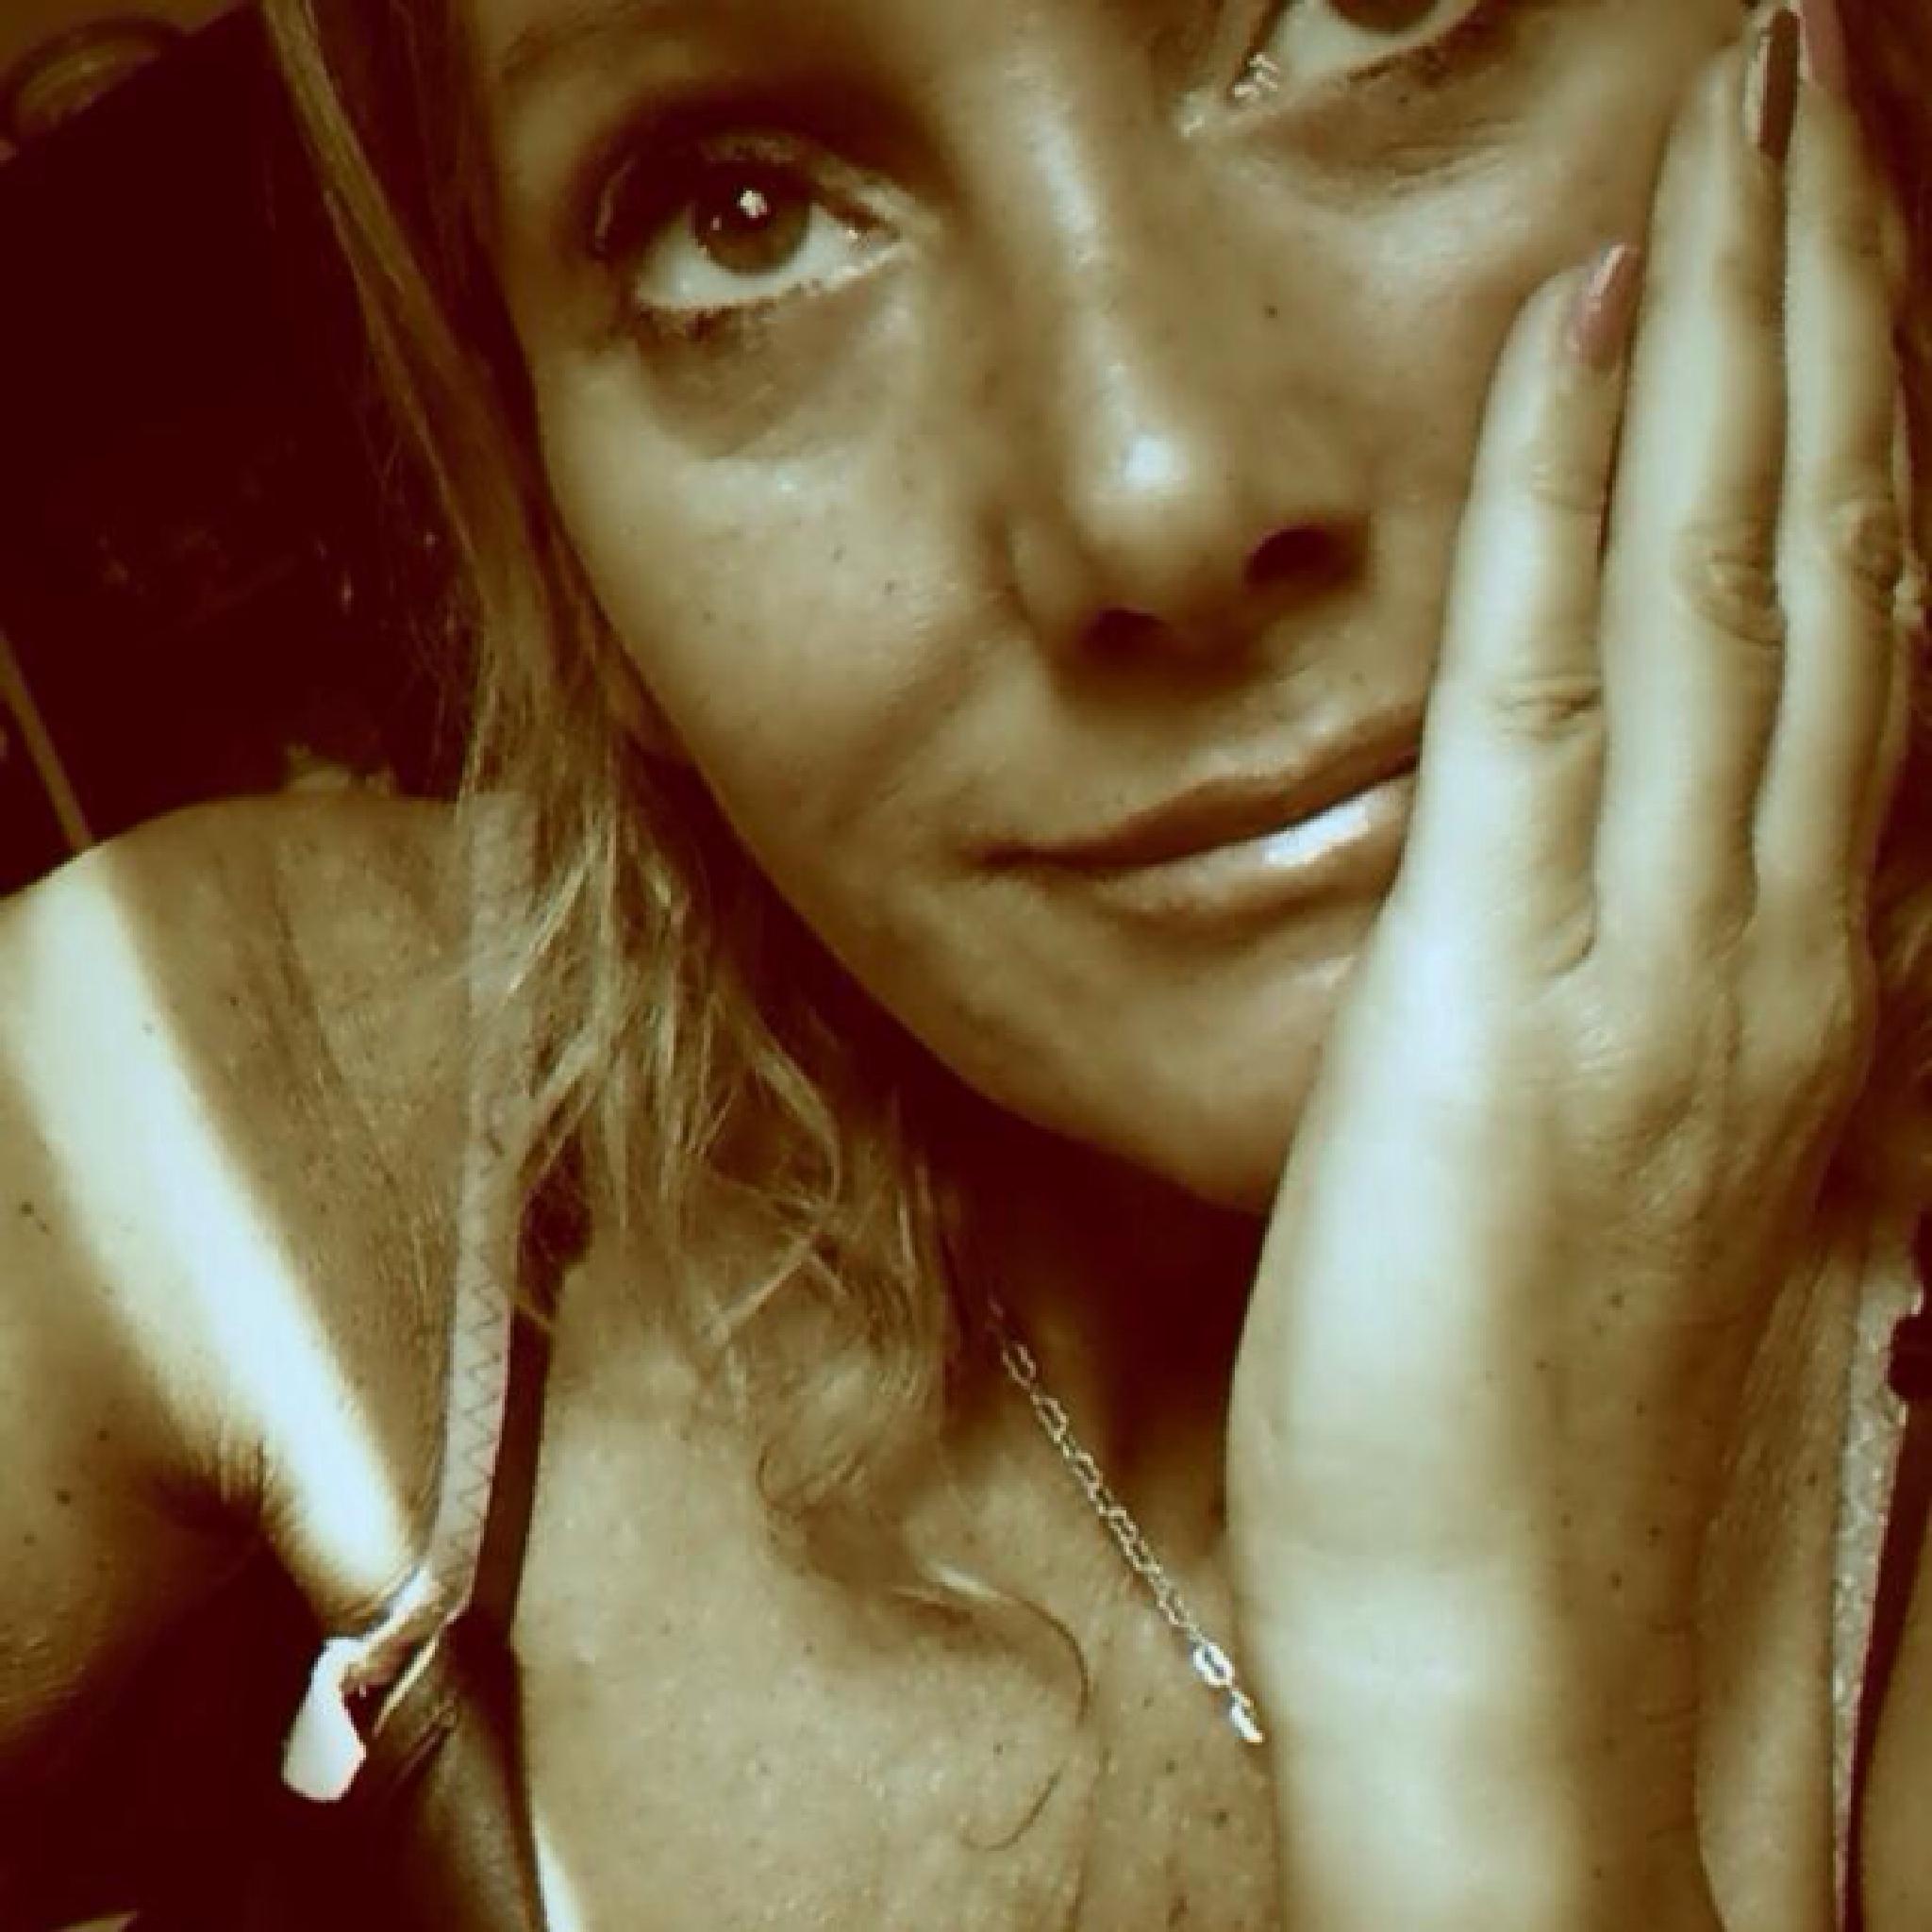 selfie #2 by elena.lena.735